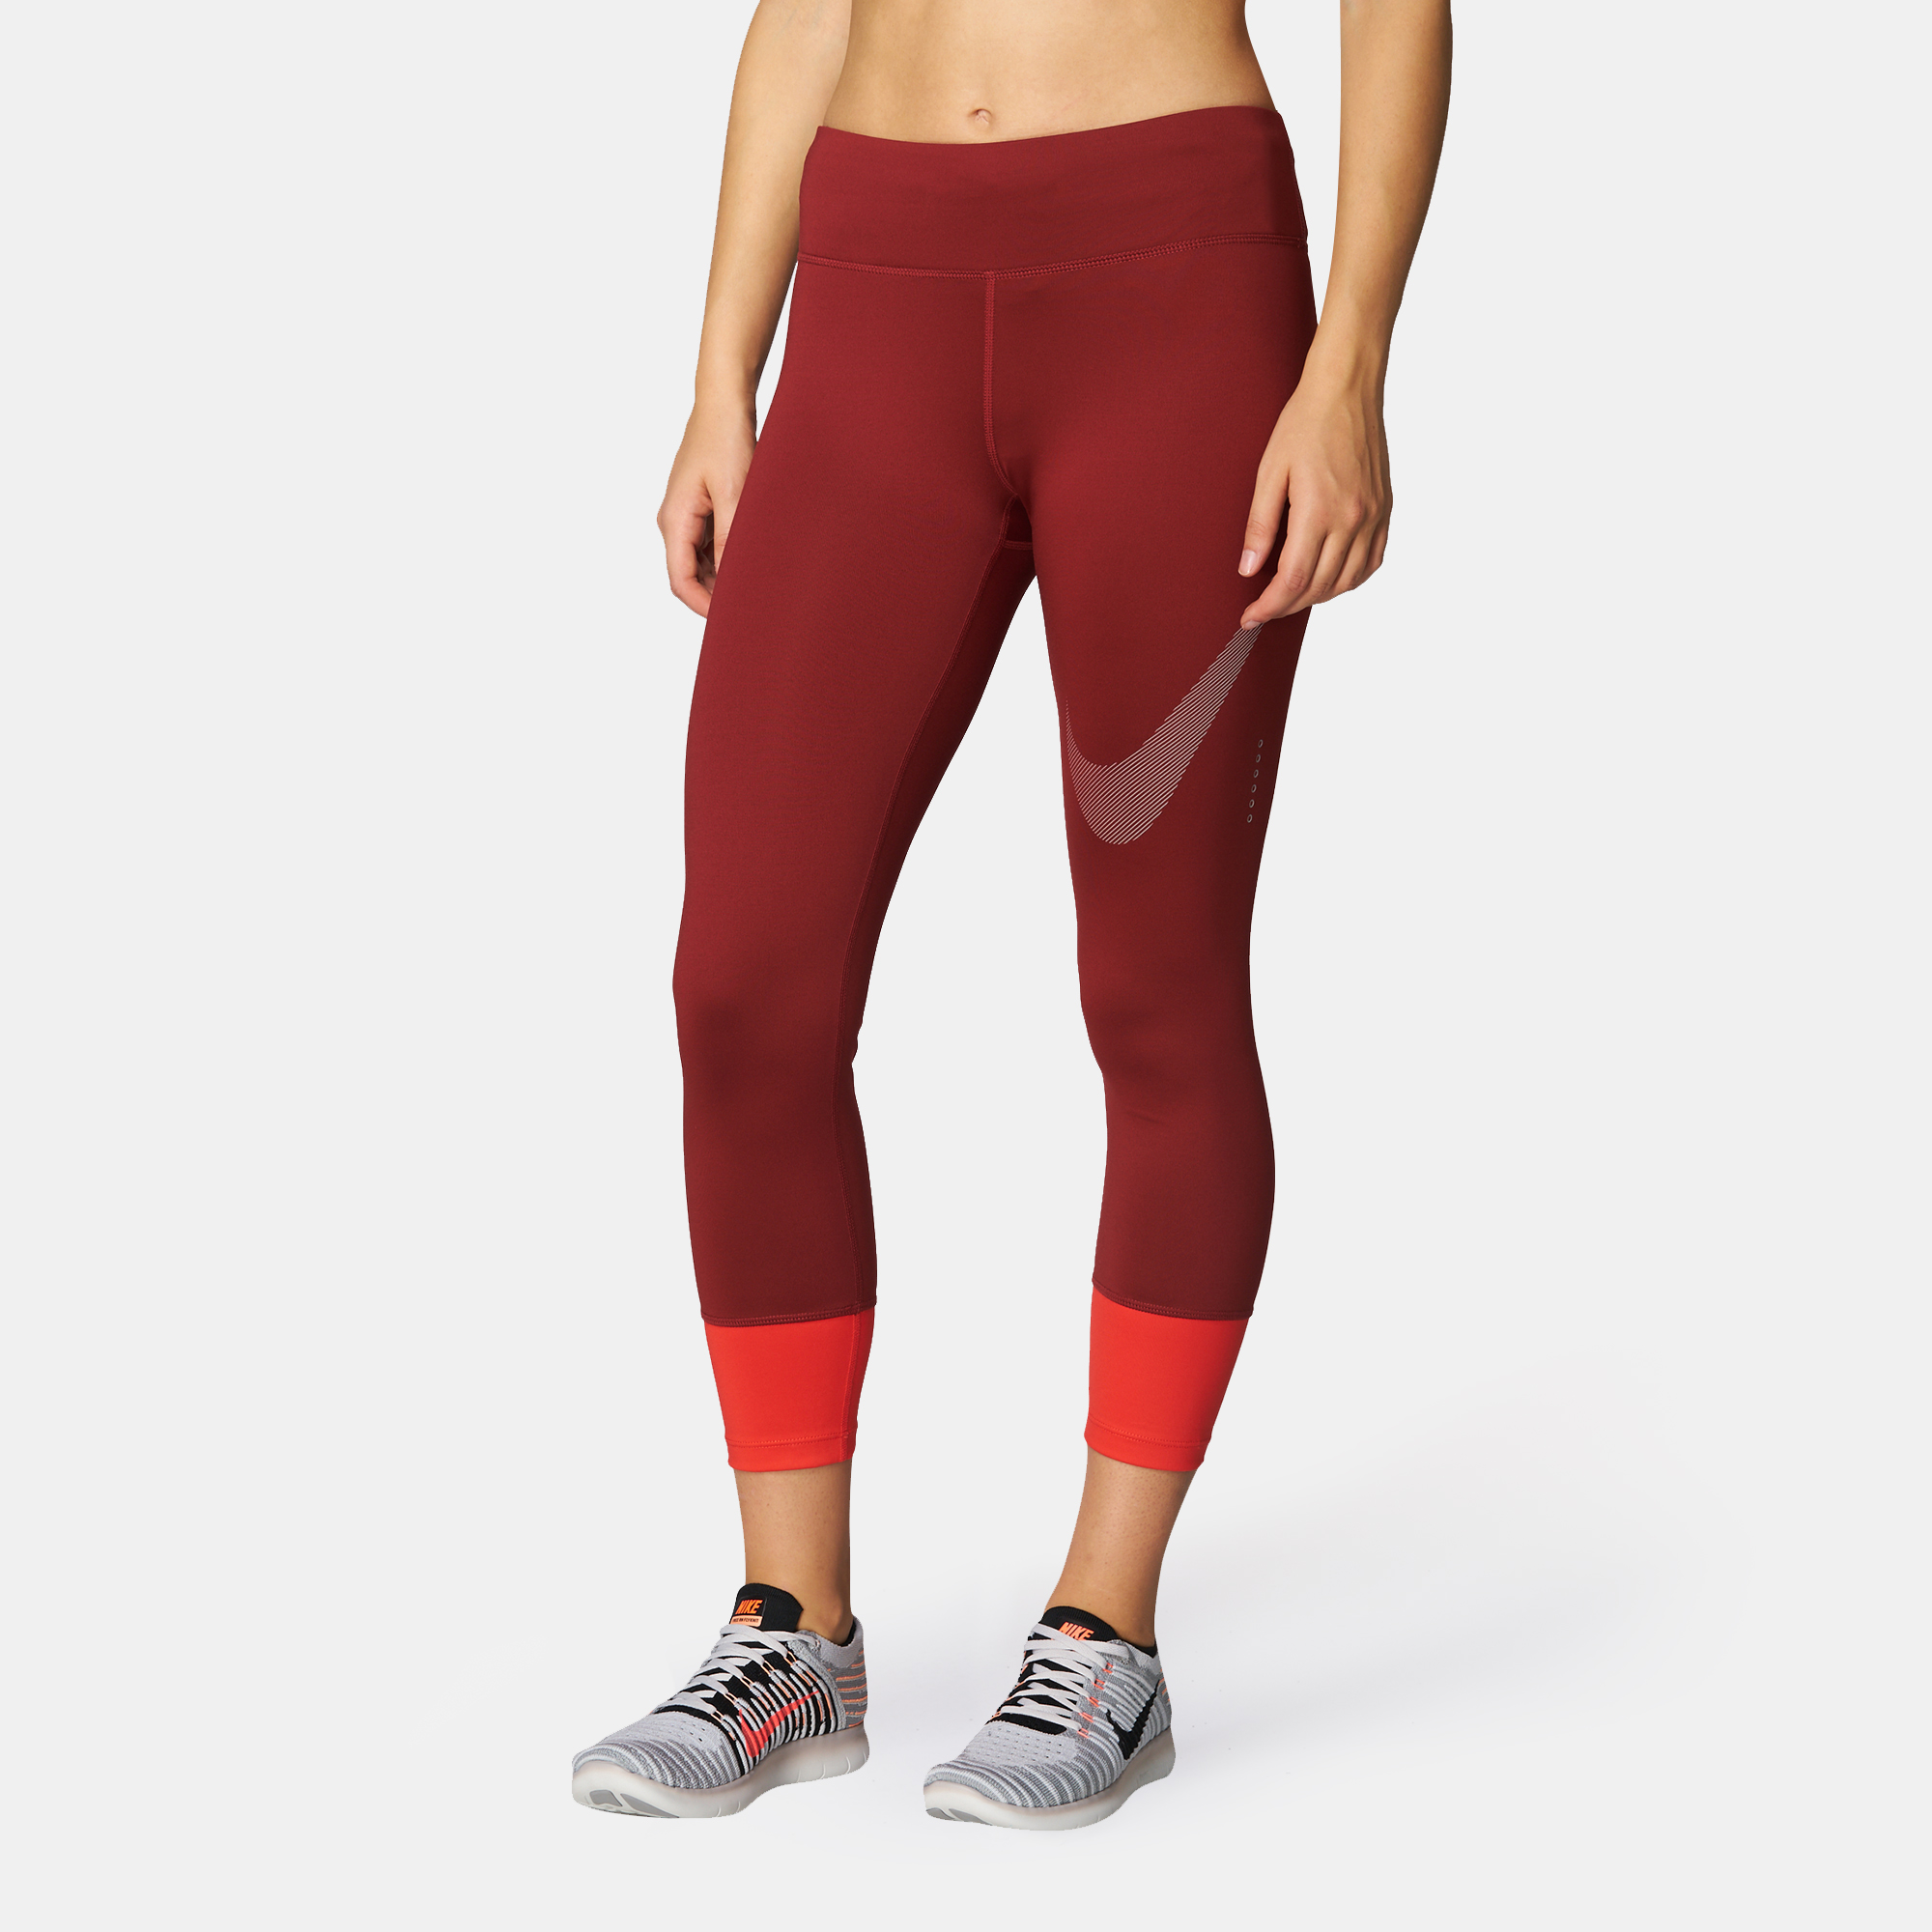 Nike Power Essential Twist Capri Leggings